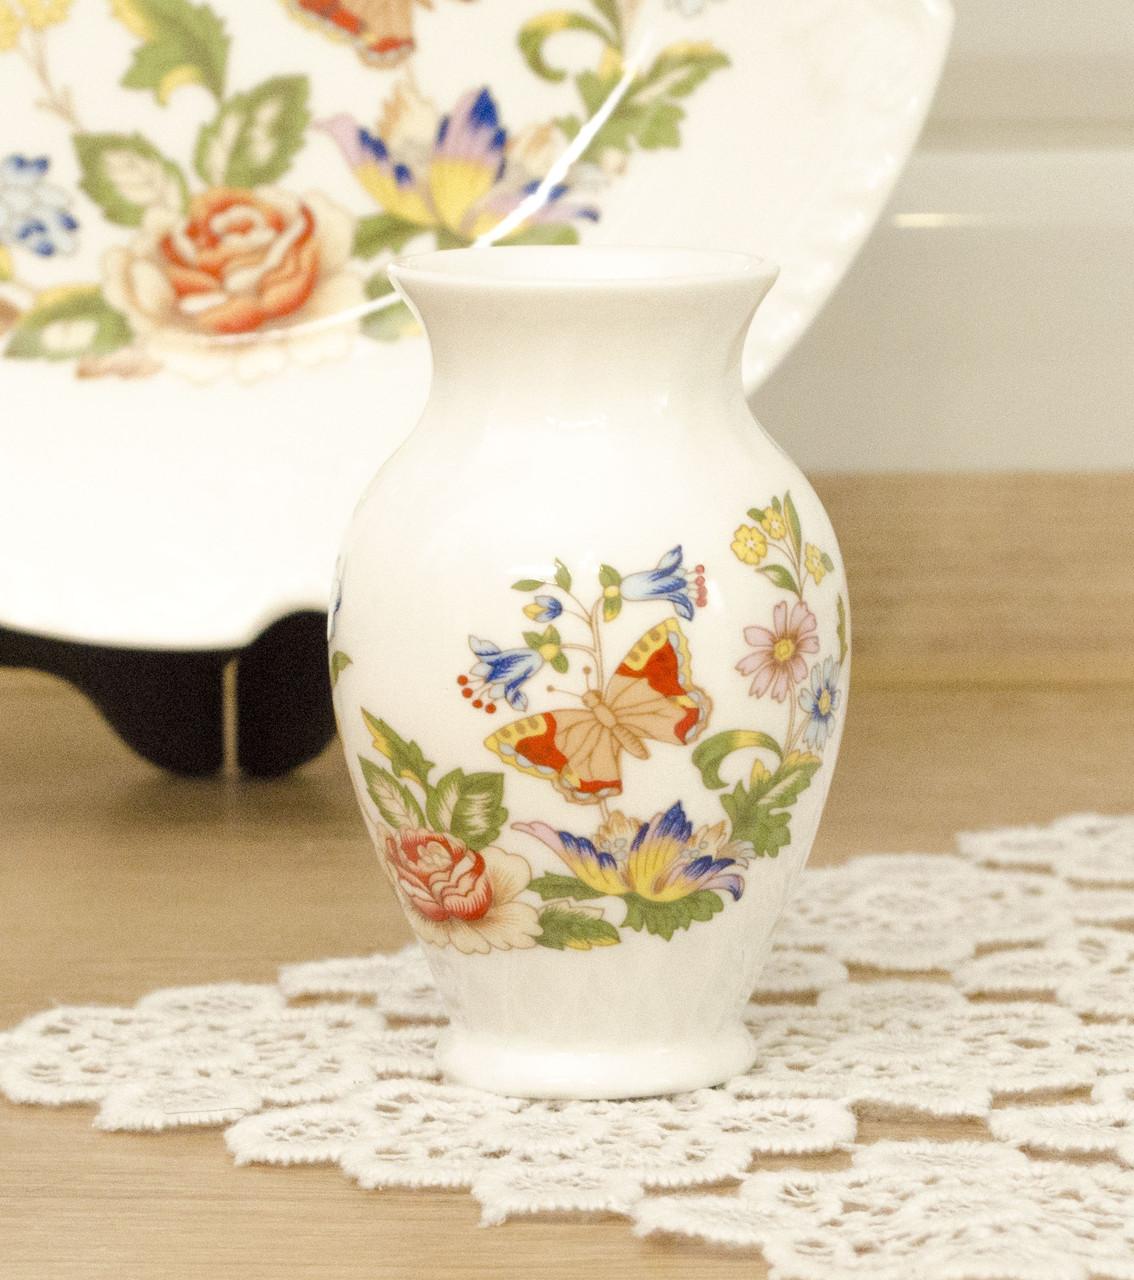 Фарфоровая декоративная вазочка, костяной фарфор, Aynsley, Англия